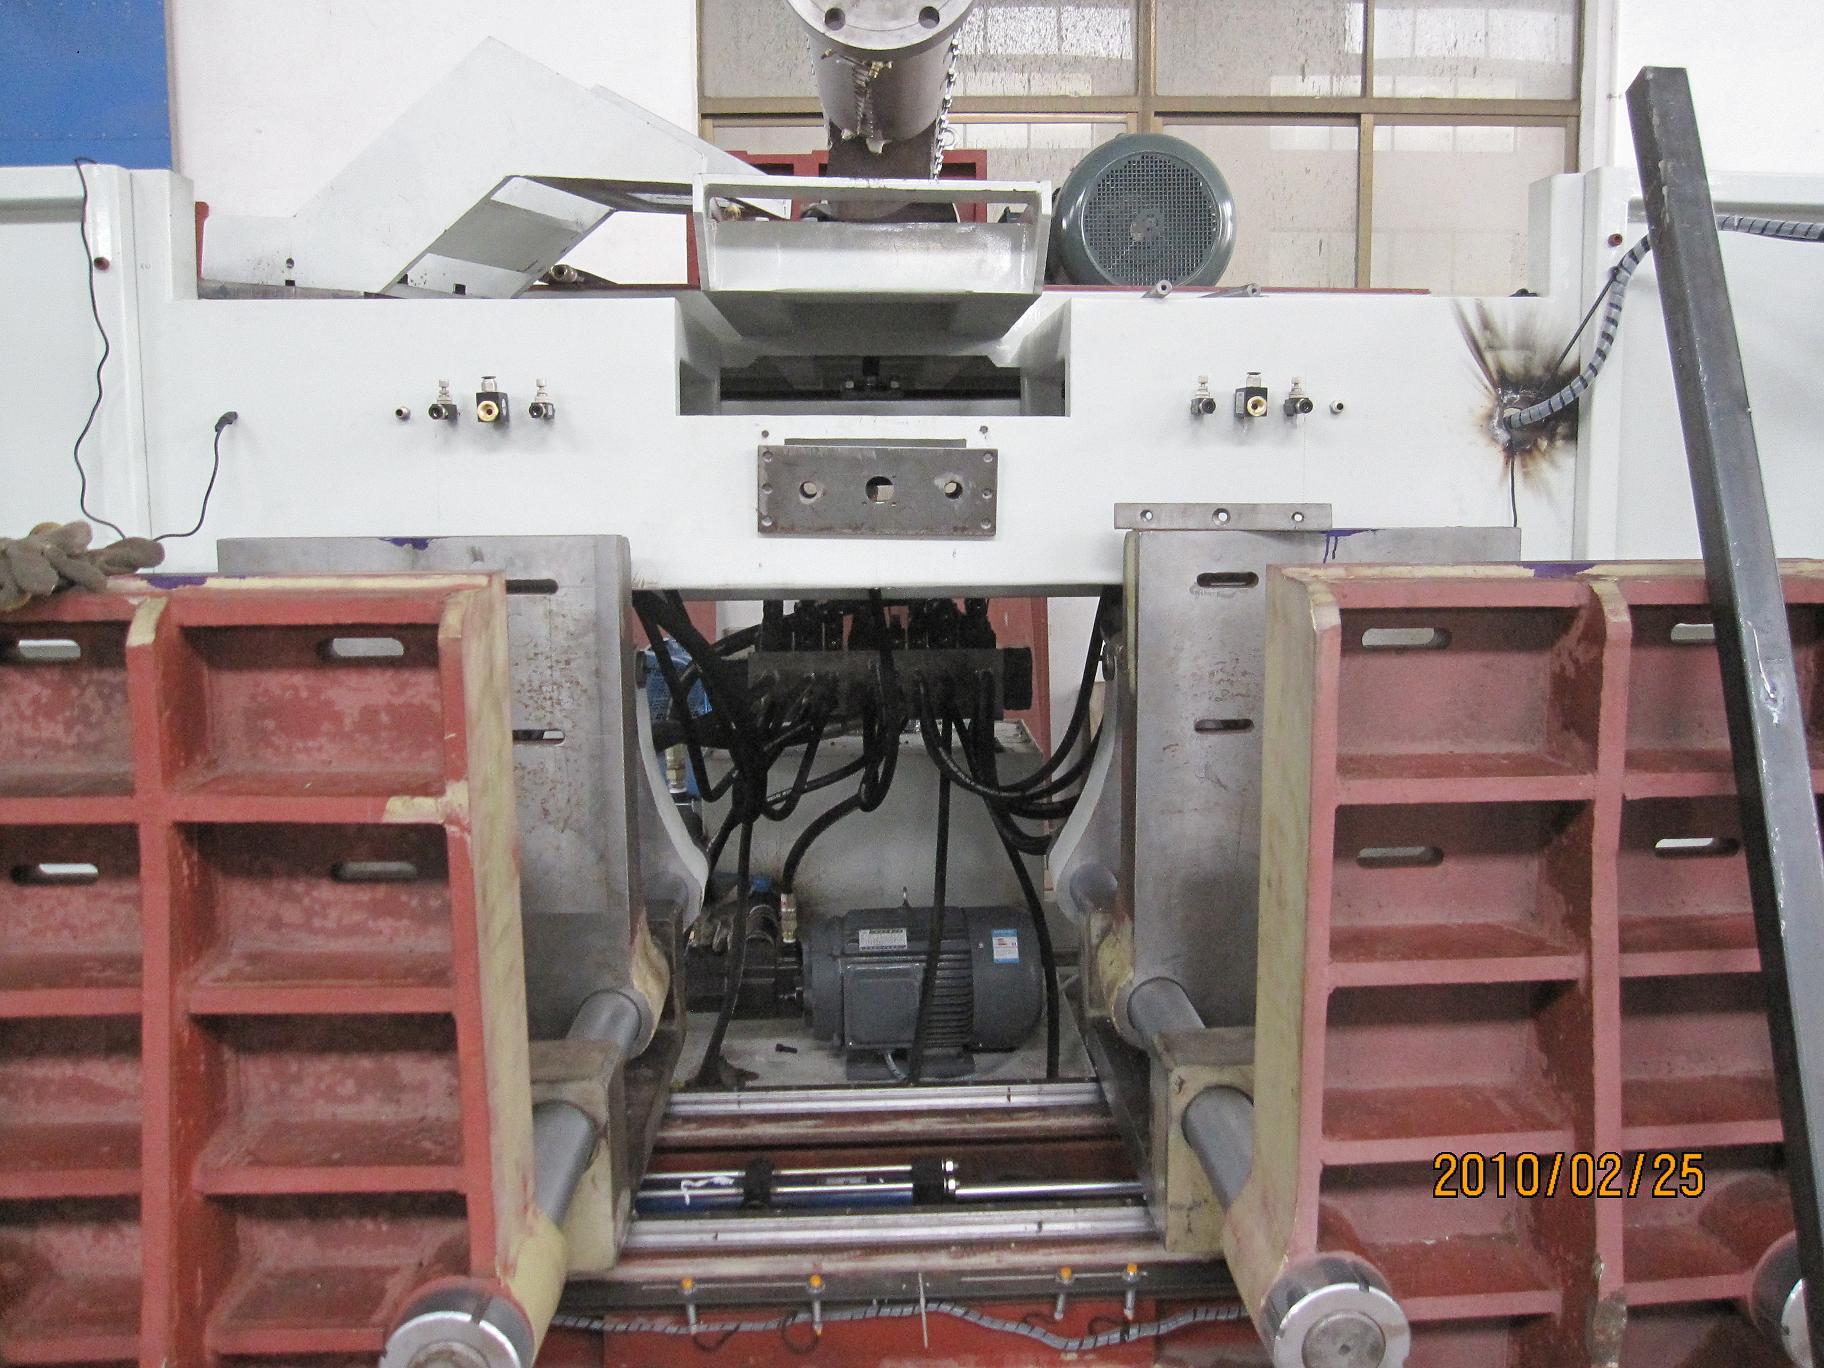 80(mm) 螺杆长径比 24 电动机功率 37(kw) 模架数量 2 采用plc控制器